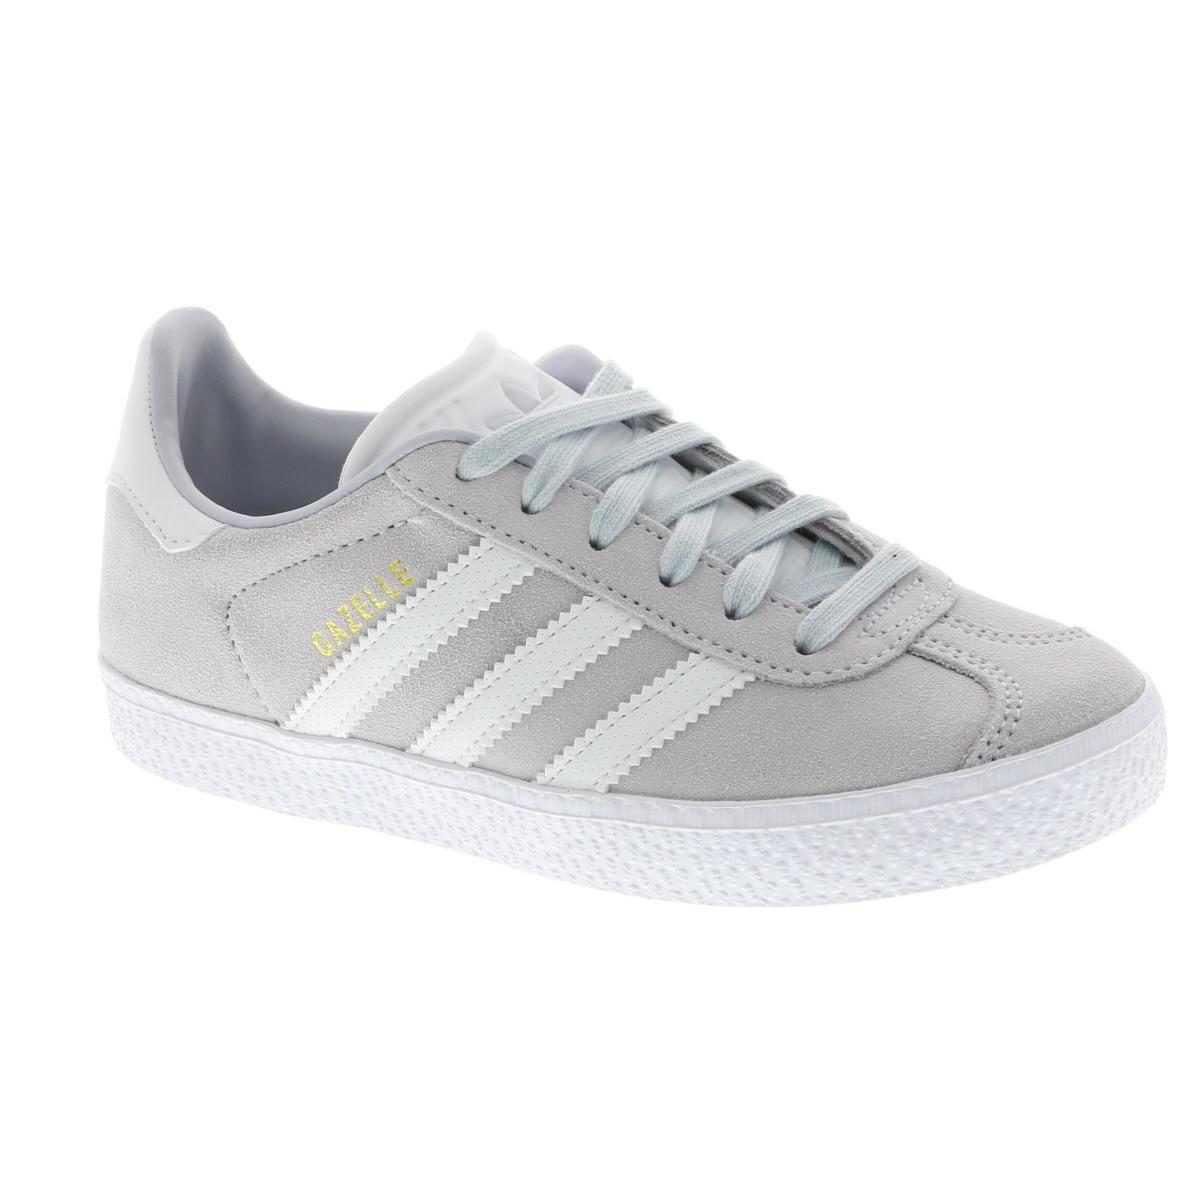 huge discount 7d552 70ae3 adidas originals. Sneakers